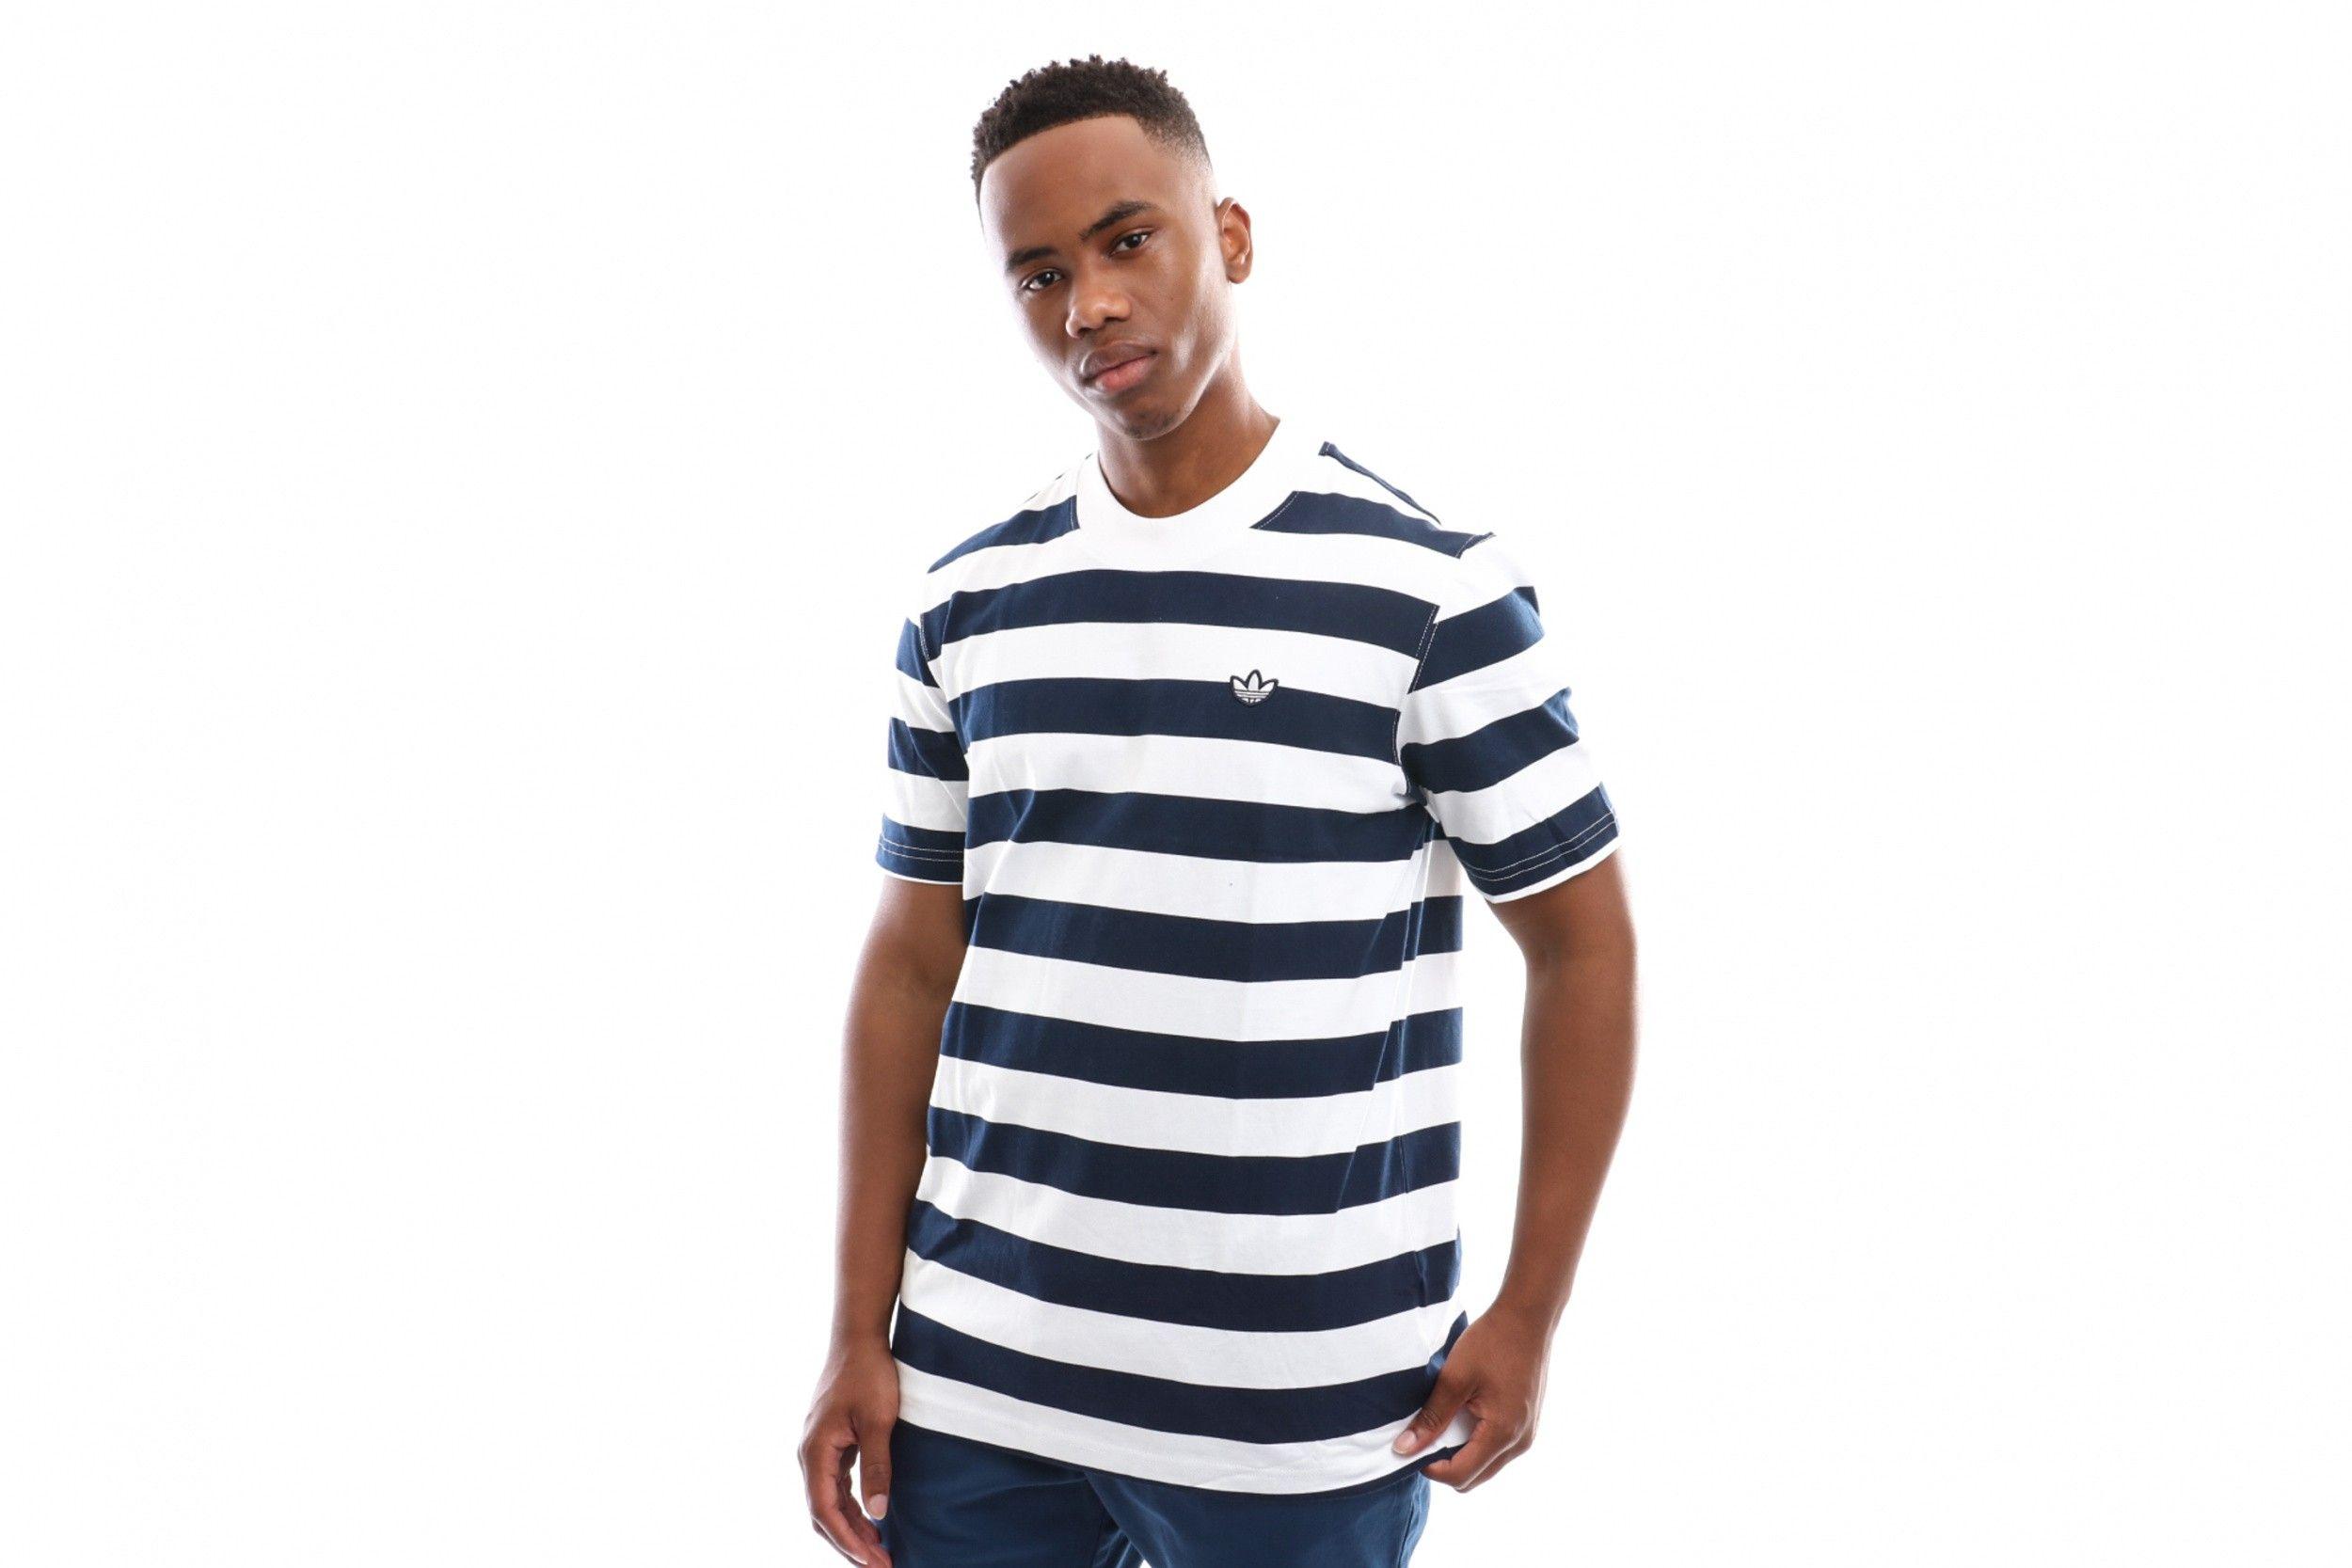 Afbeelding van Adidas Stripe Tee Ec9304 T Shirt Night Indigo/White